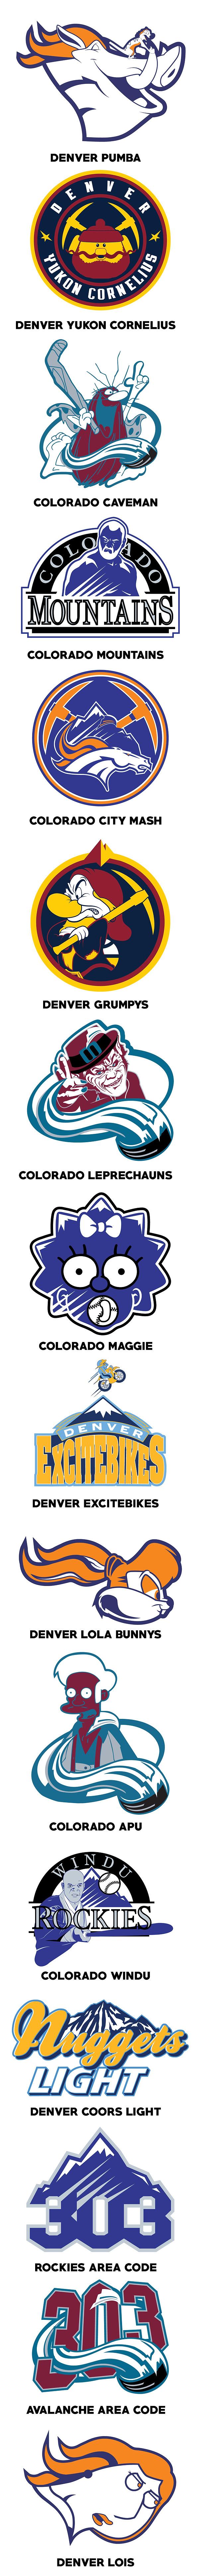 ALL_MASHUPS_Colorado.jpg